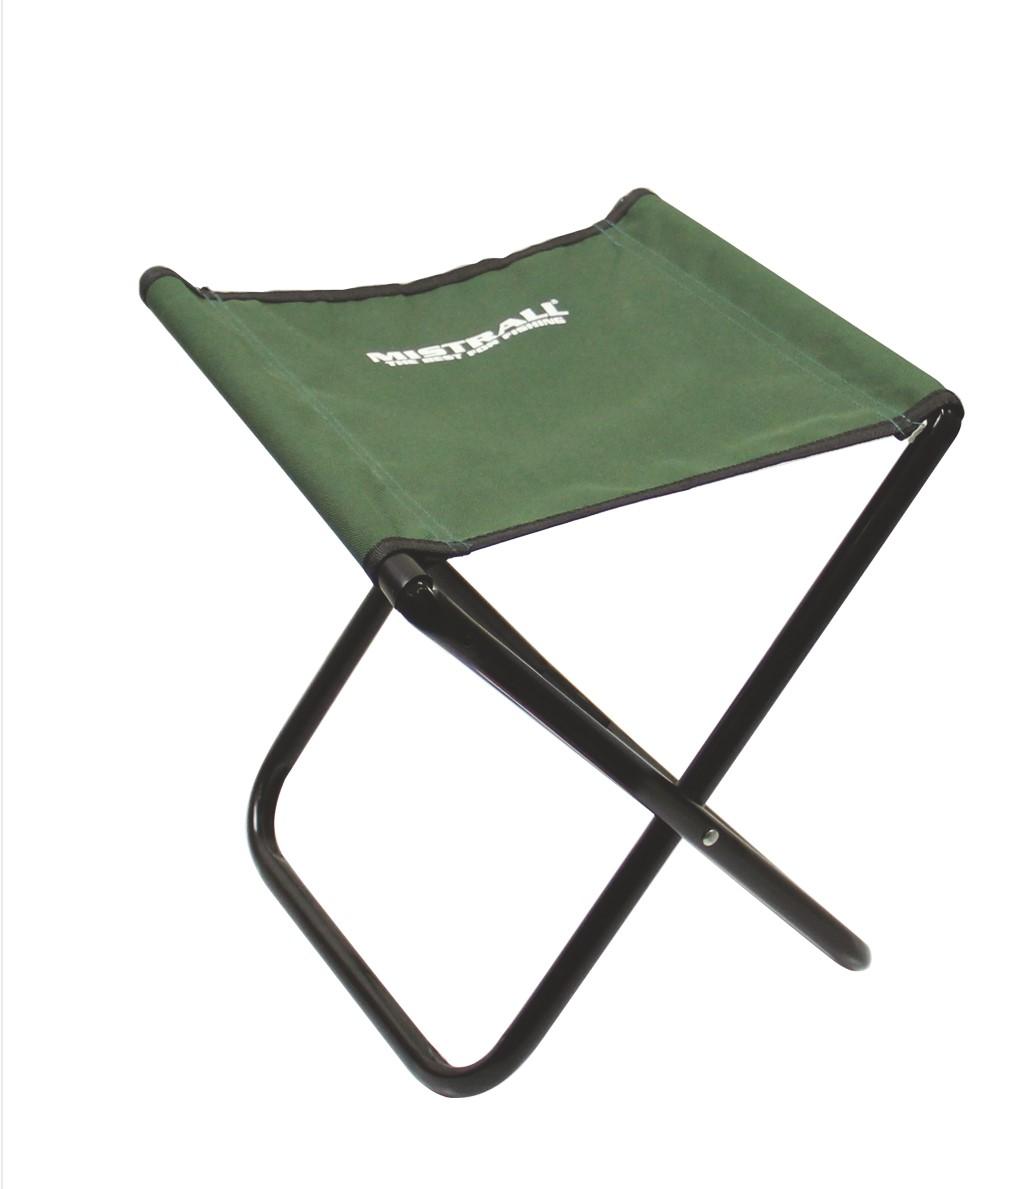 Mistrall židlička bez opěradla M, zelená